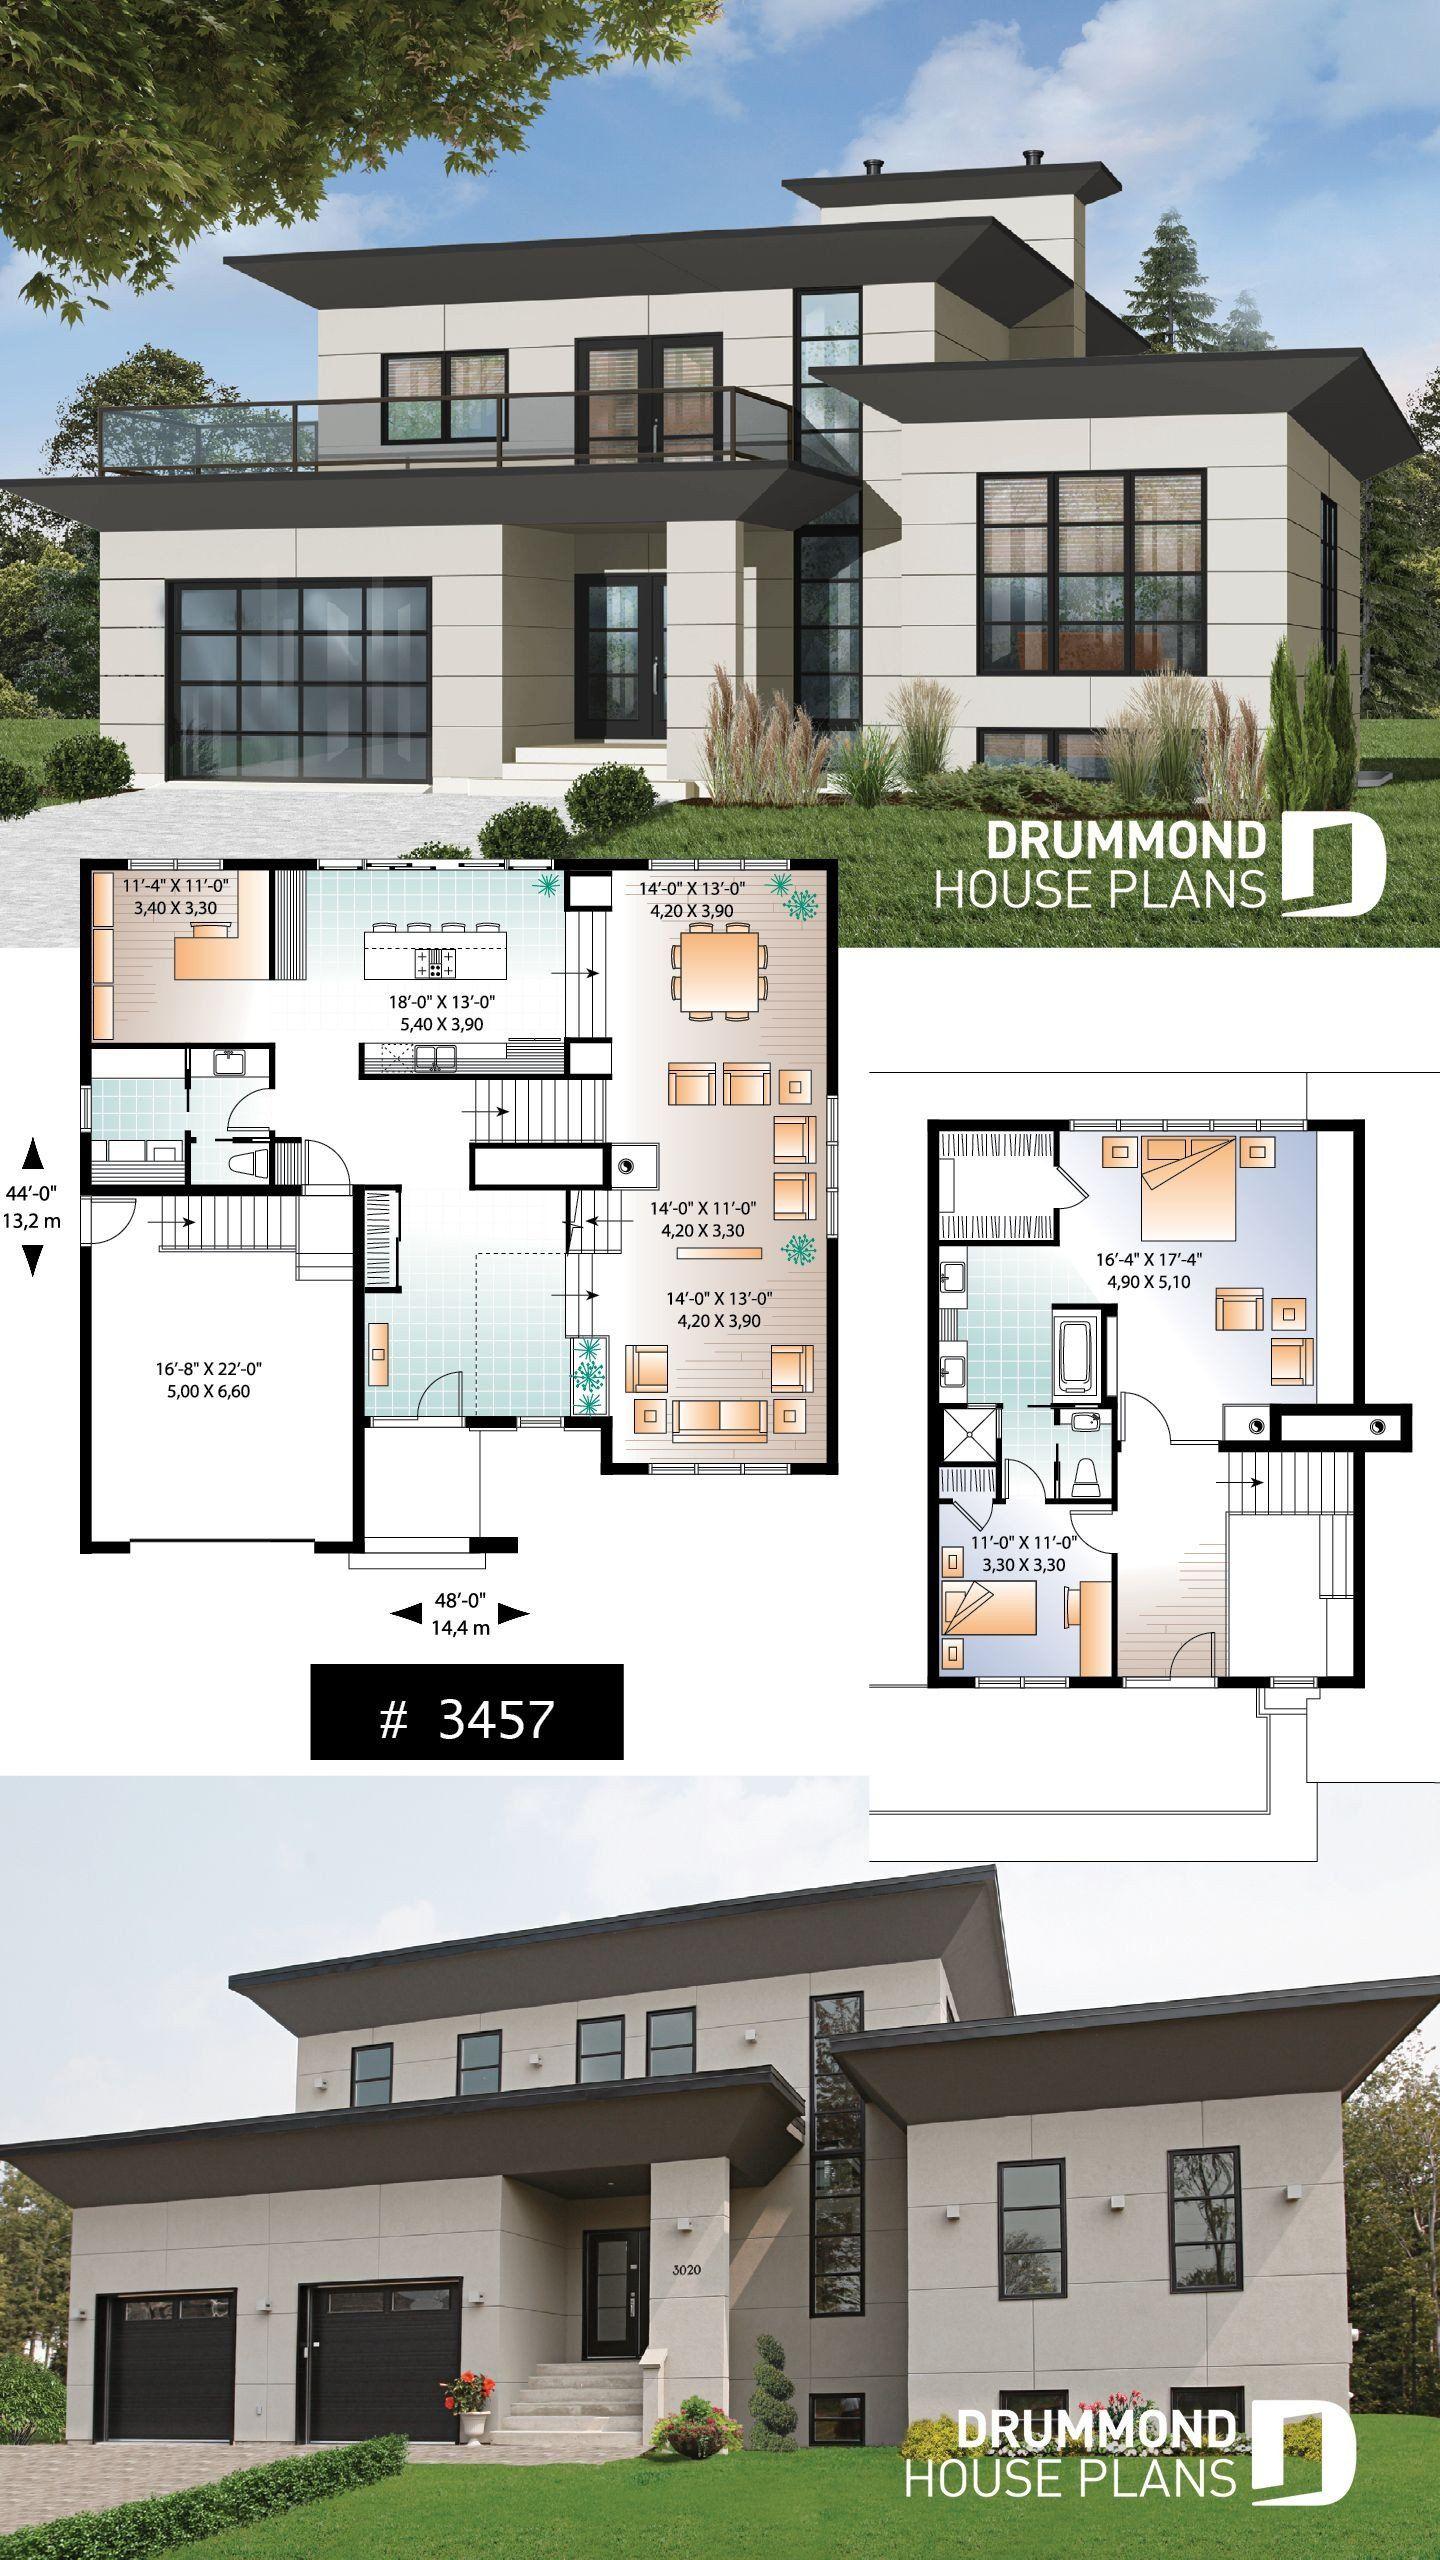 Sims 4 Modern House Floor Plan House Plan Caldwell No 3457 In 2020 Modern House Floor Plans Contemporary House Plans Mansion Floor Plan